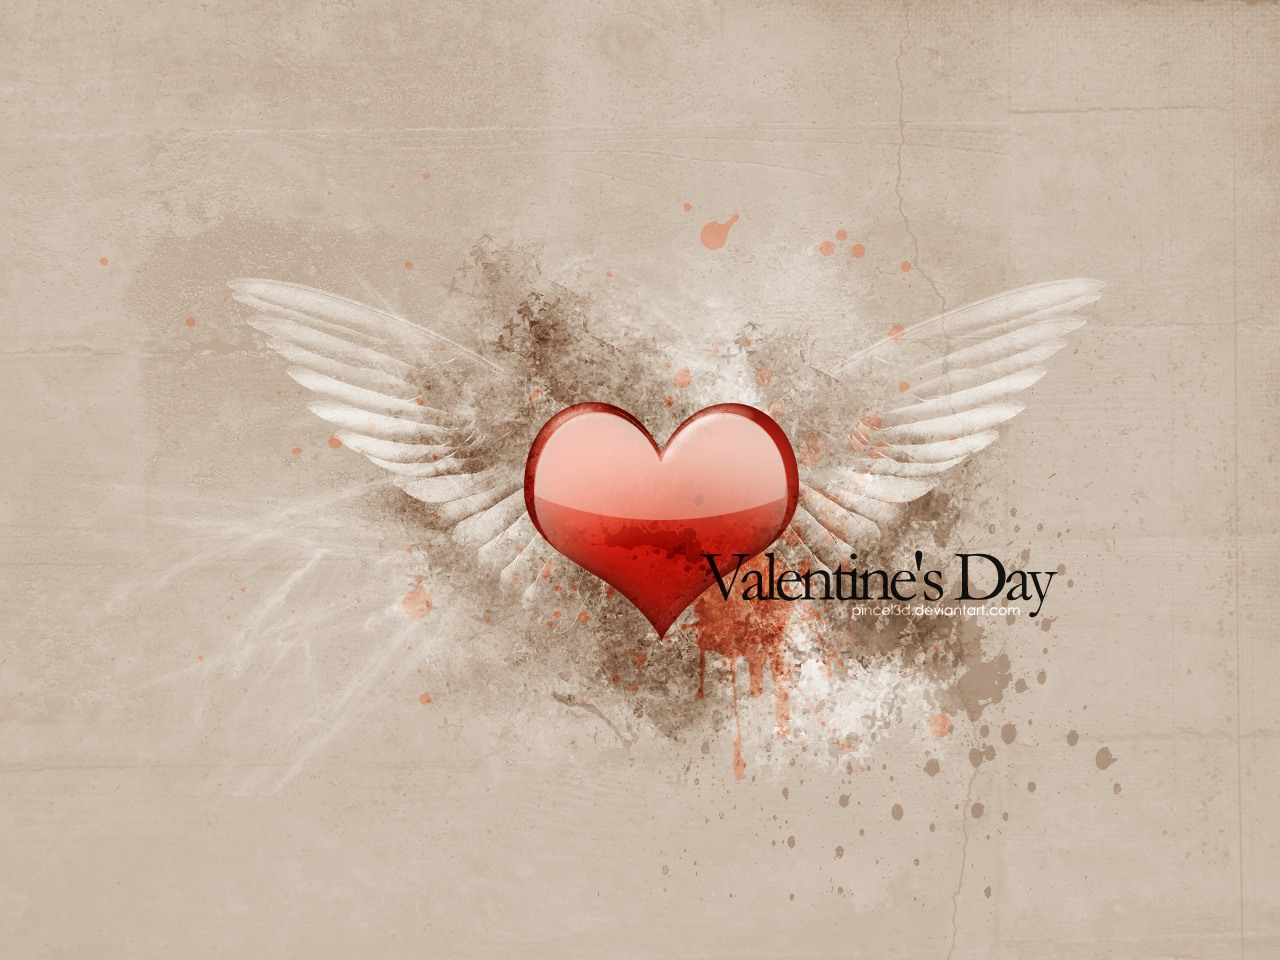 Valentines Day Here PersephoneVics World